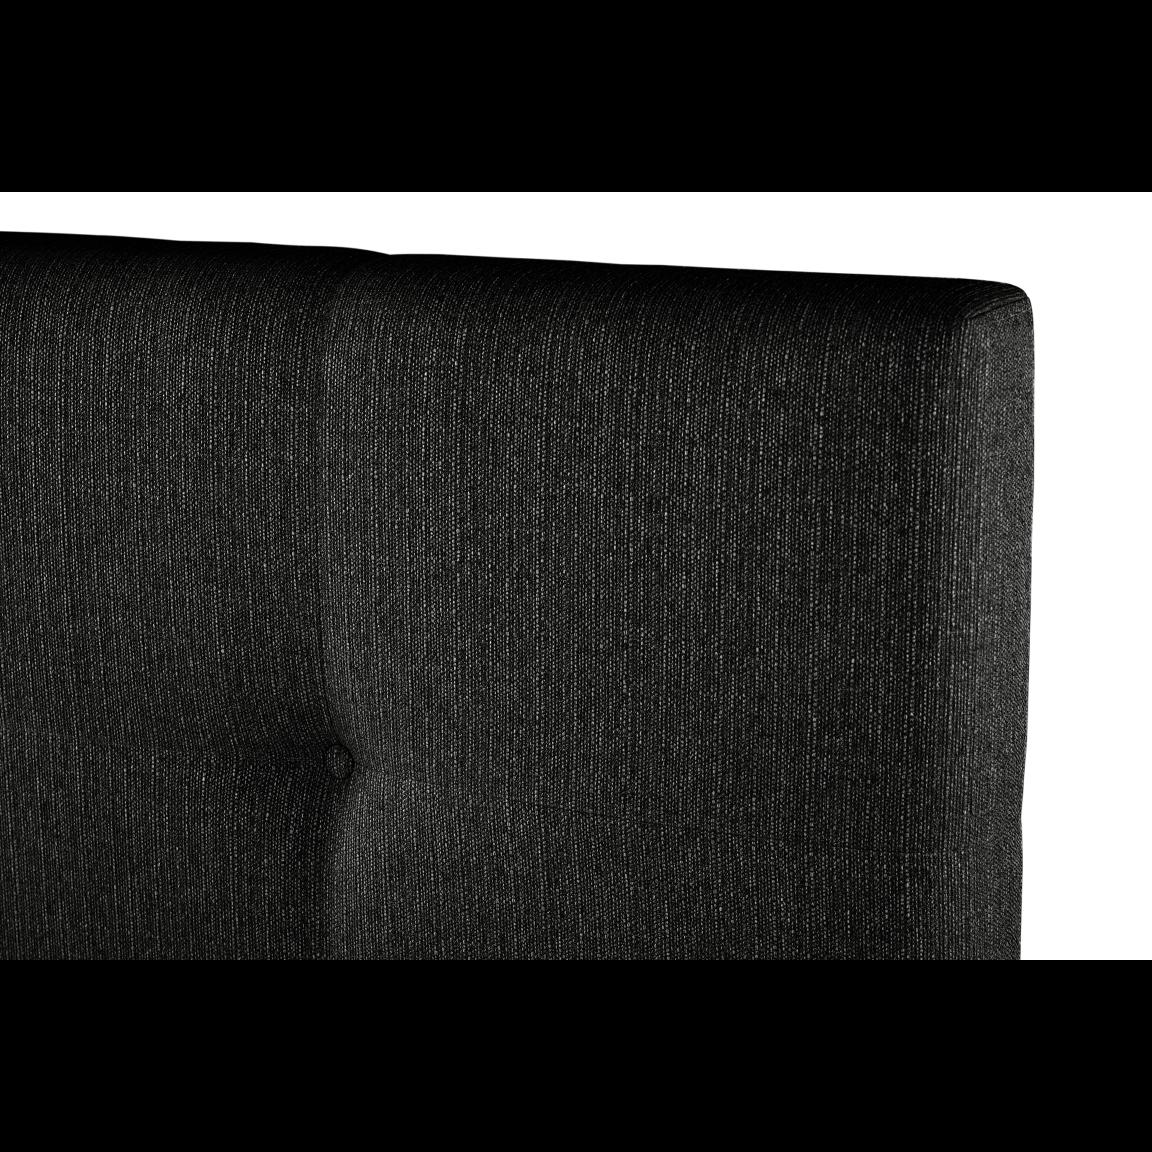 Gepolstertes Bett Cobalt   Schwarz-140 x 200 cm